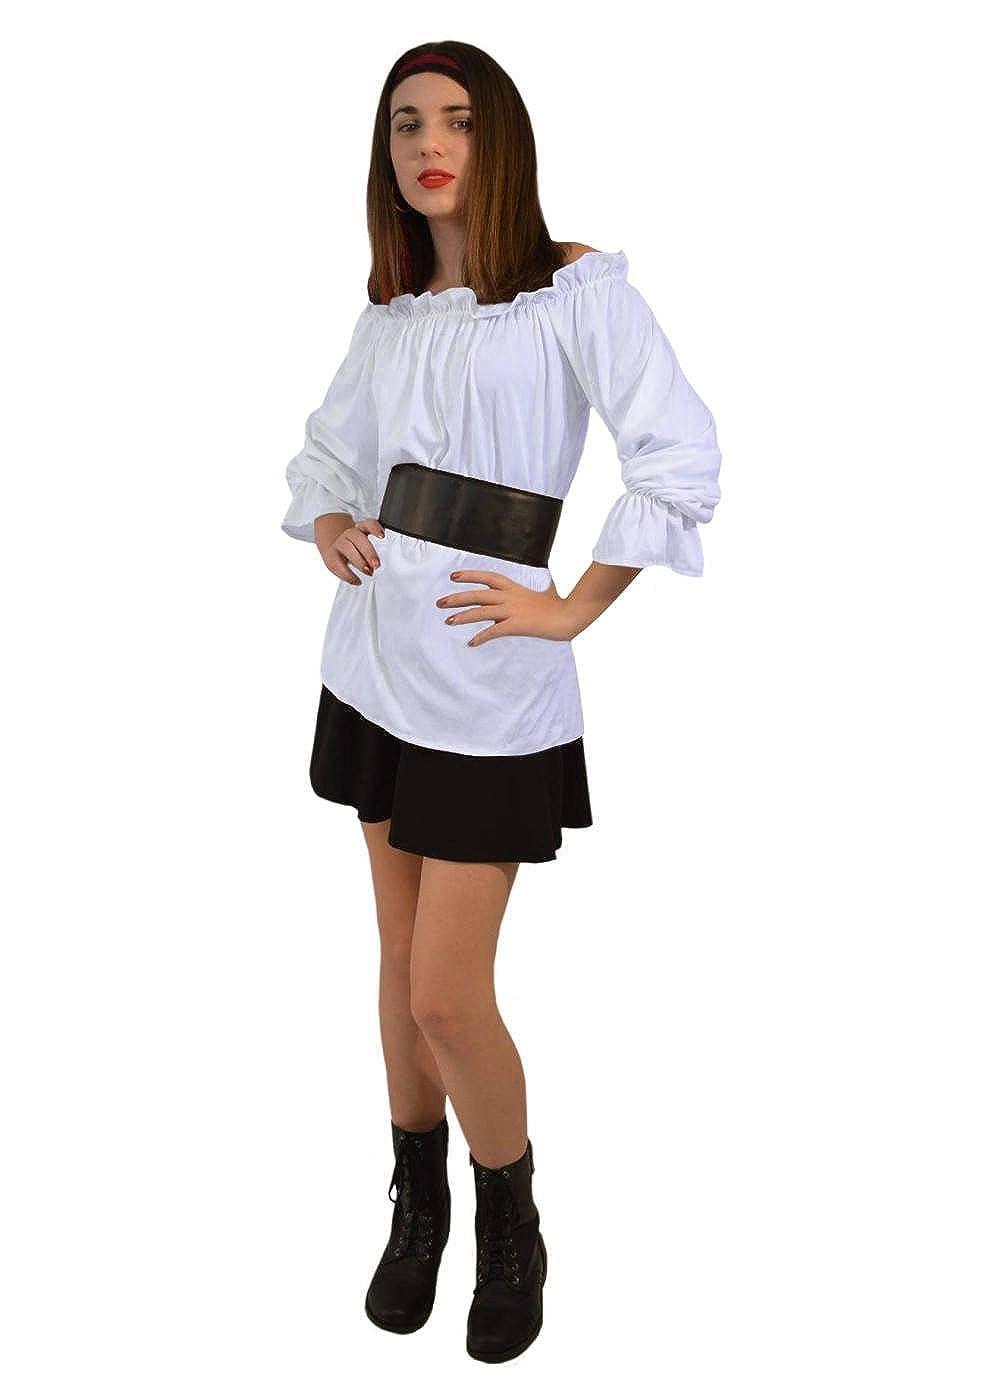 2a7fef496a Amazon.com: Renaissance Long Sleeve White Blouse Women Shirt: Clothing